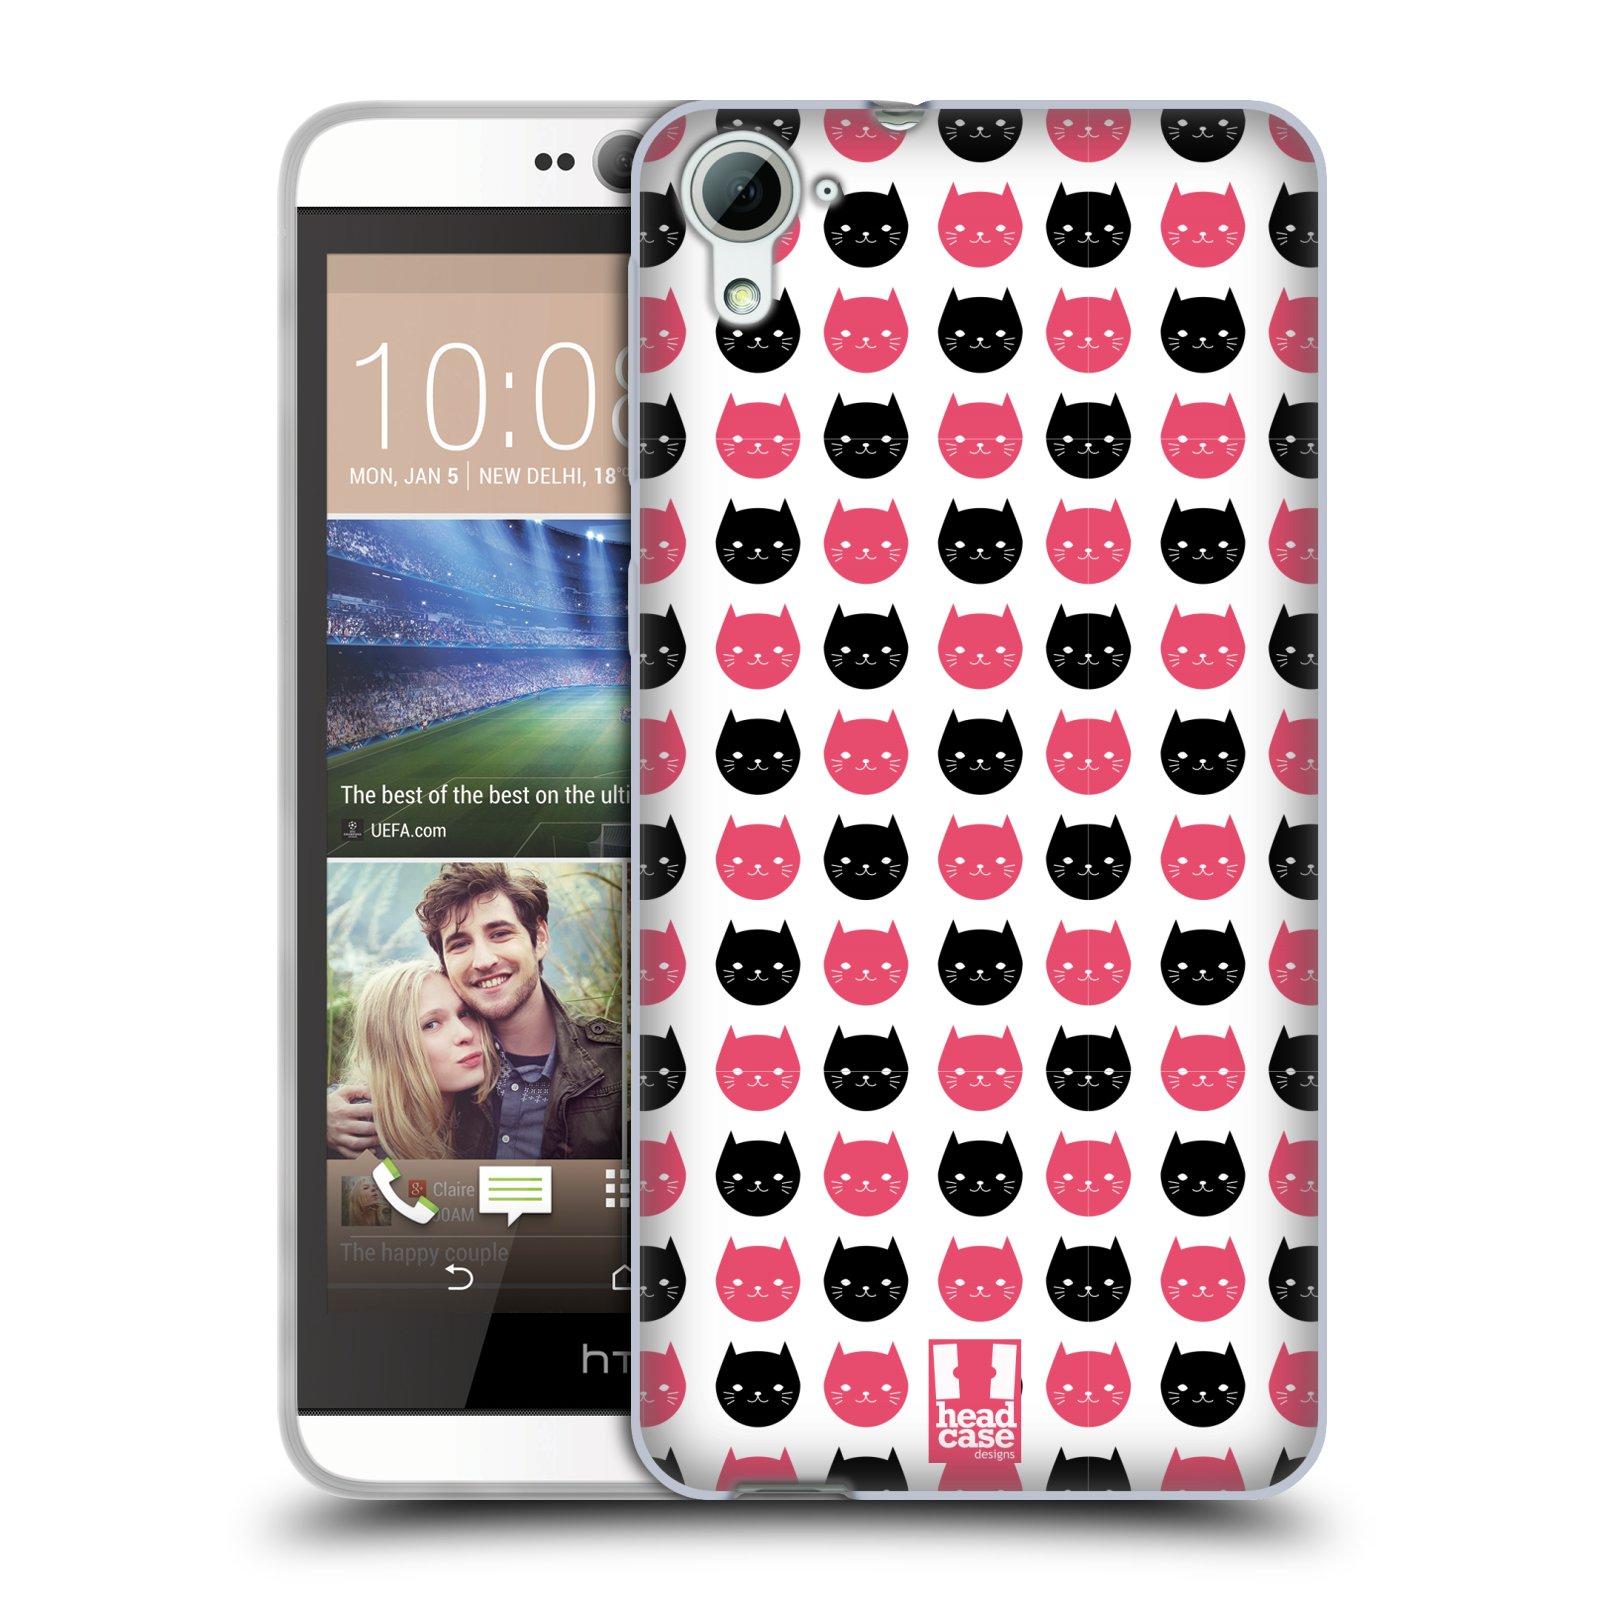 Silikonové pouzdro na mobil HTC Desire 826 HEAD CASE KOČKY Black and Pink (Silikonový kryt či obal na mobilní telefon HTC Desire 826 Dual SIM)